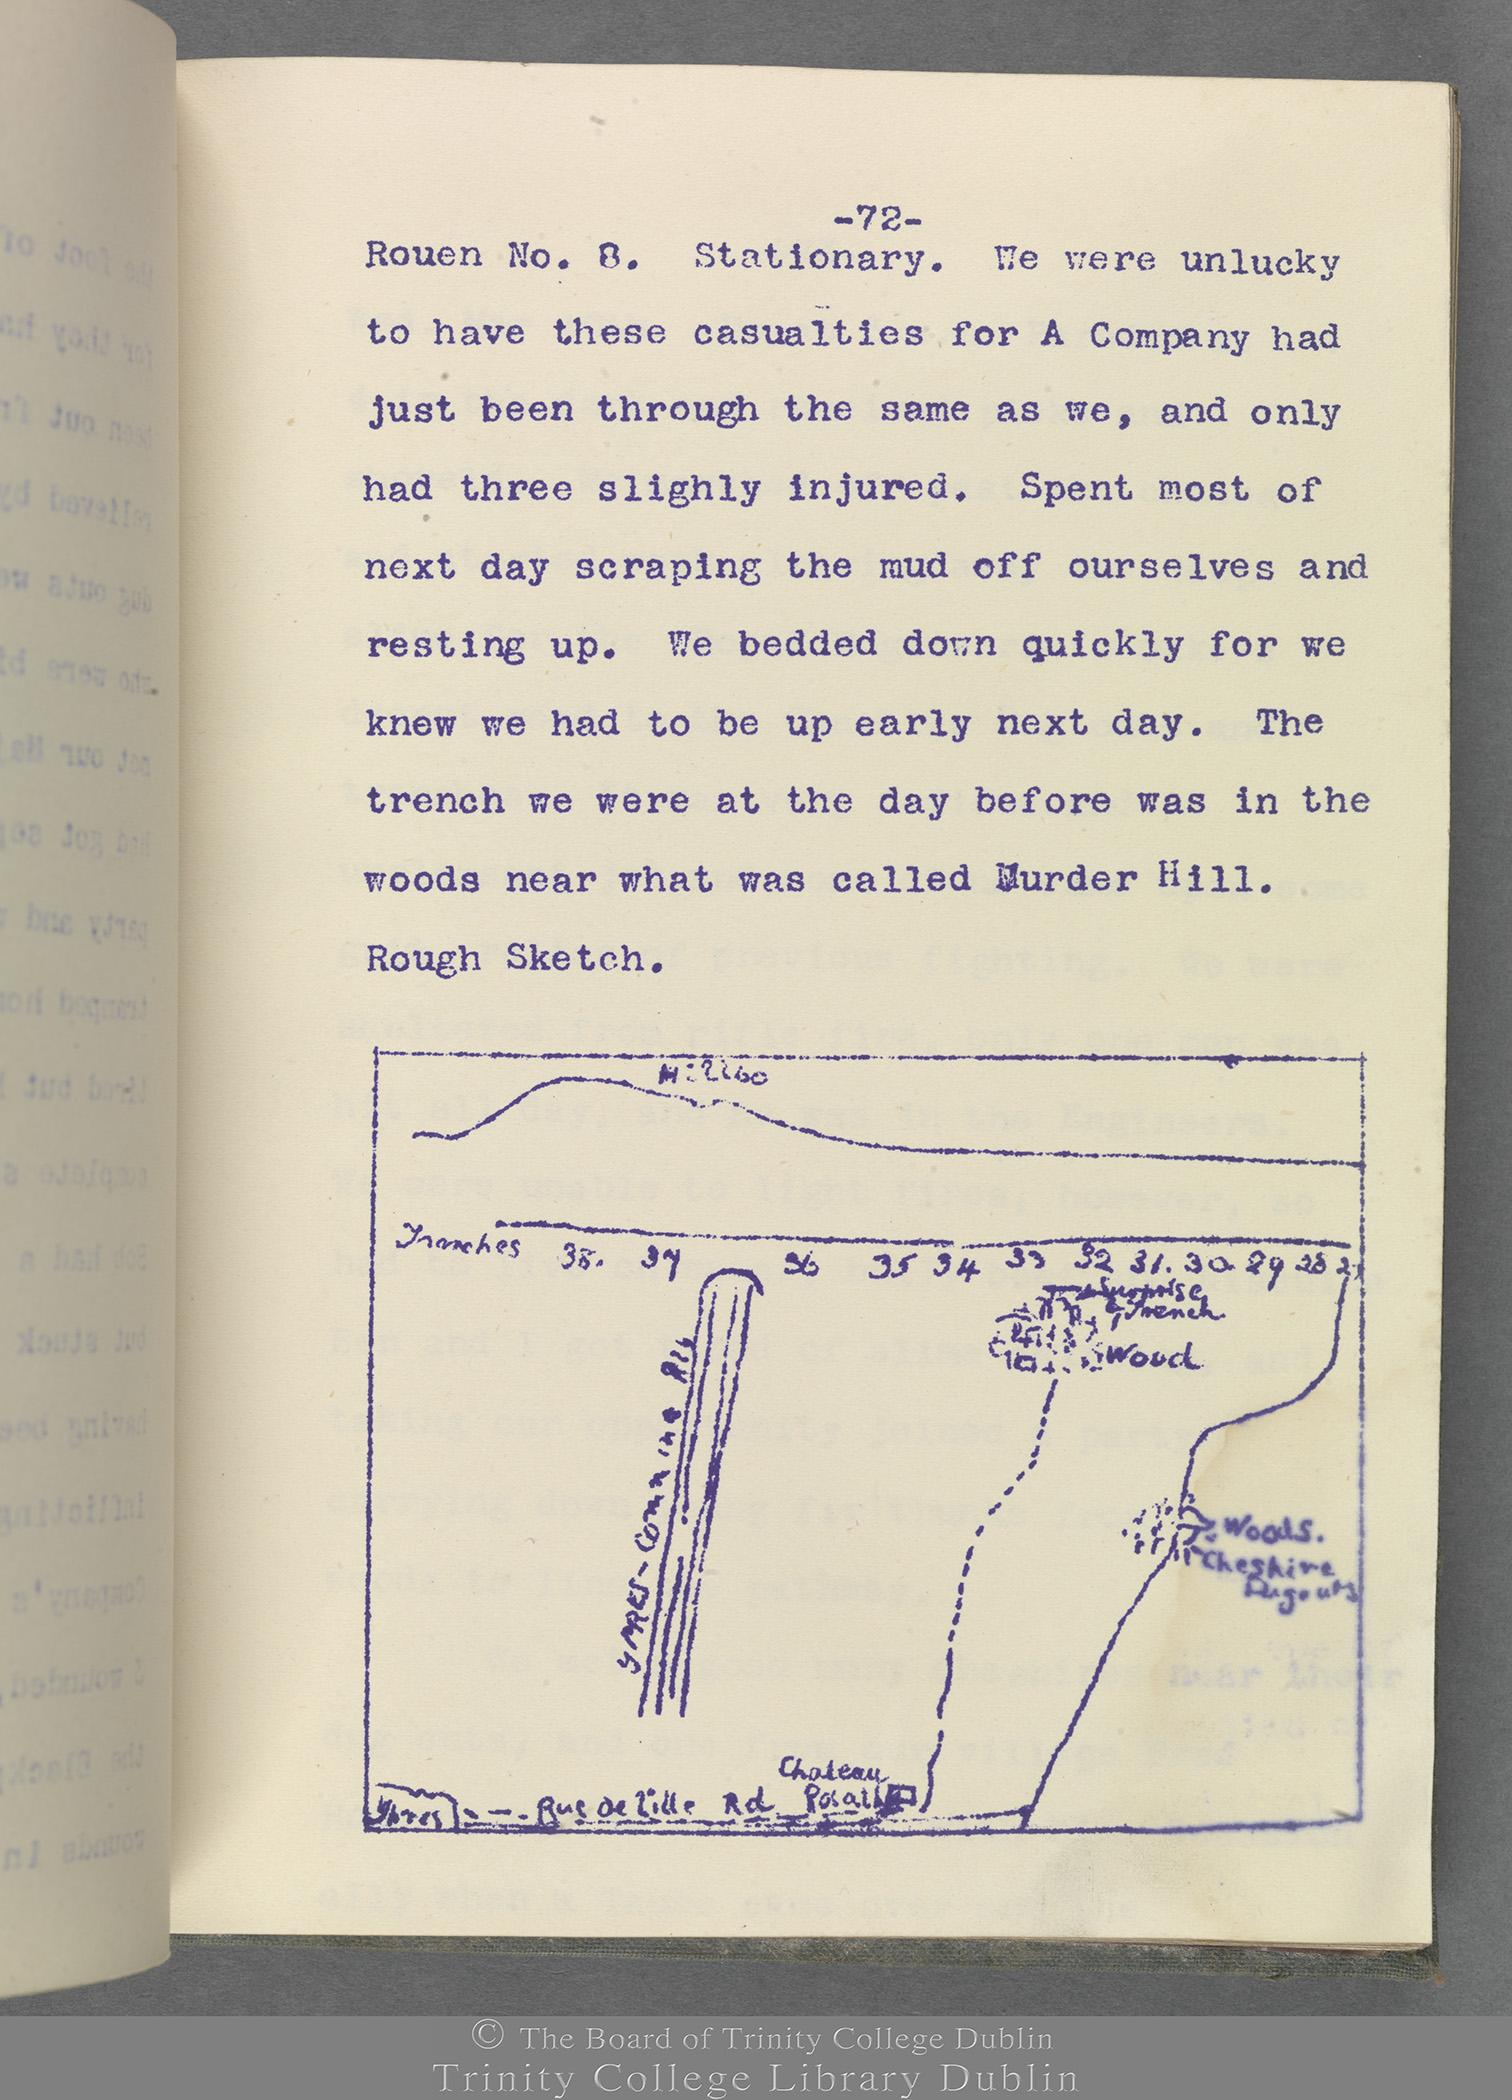 TCD MS 10853 folio 72 recto